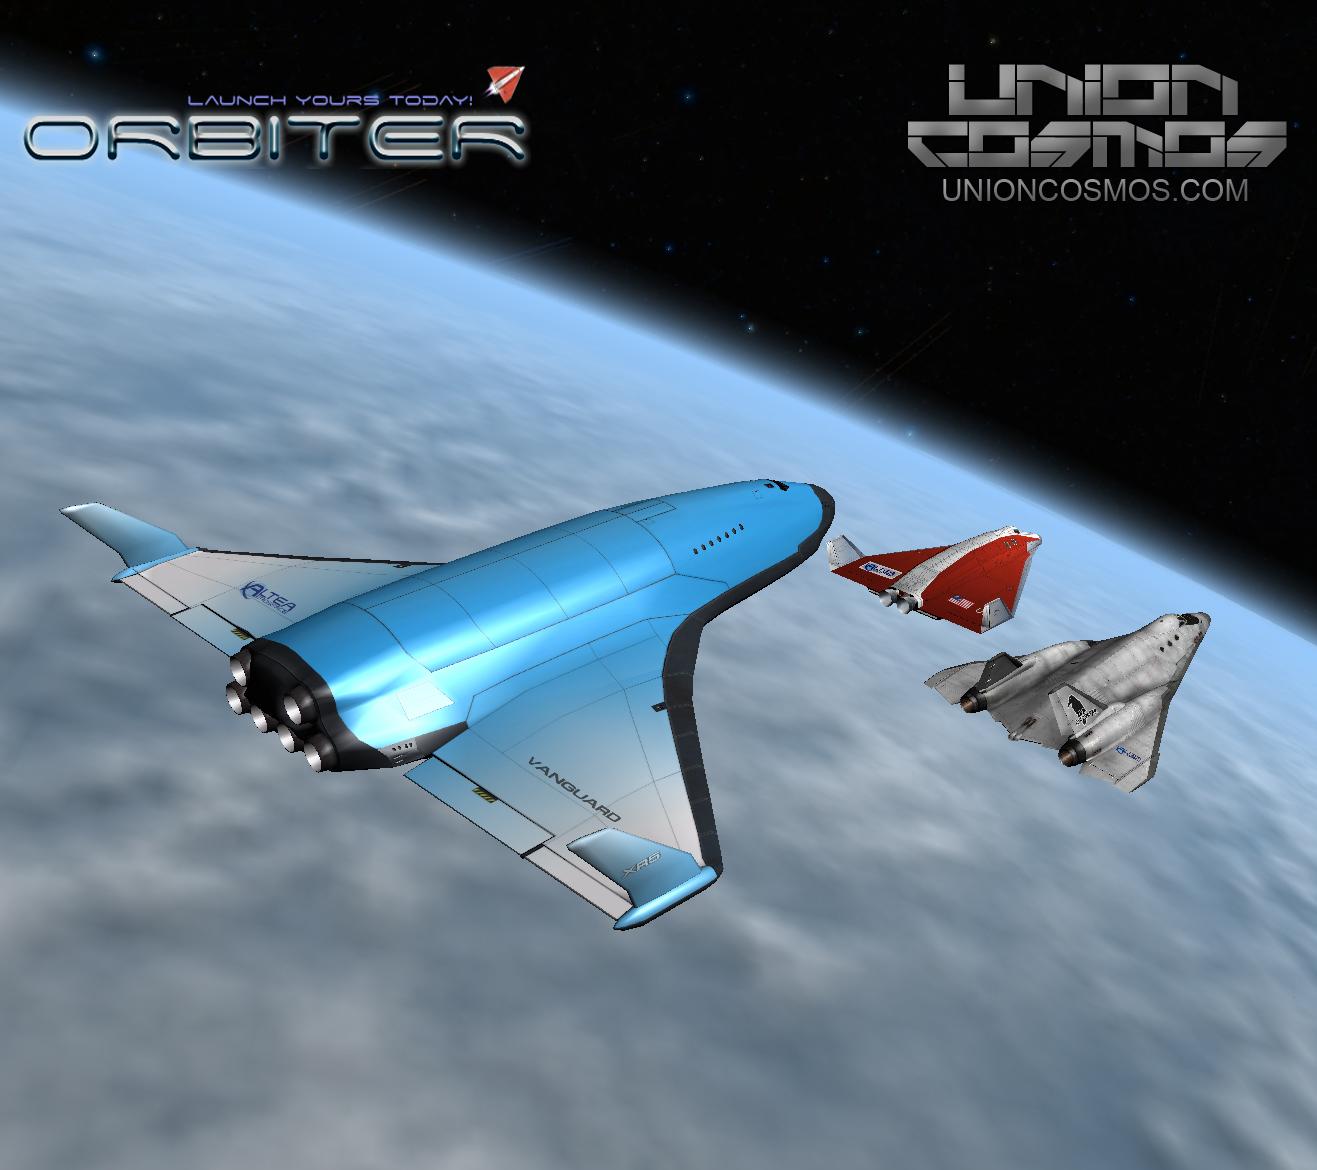 Union-Cosmos-Orbiter-XR-fleet